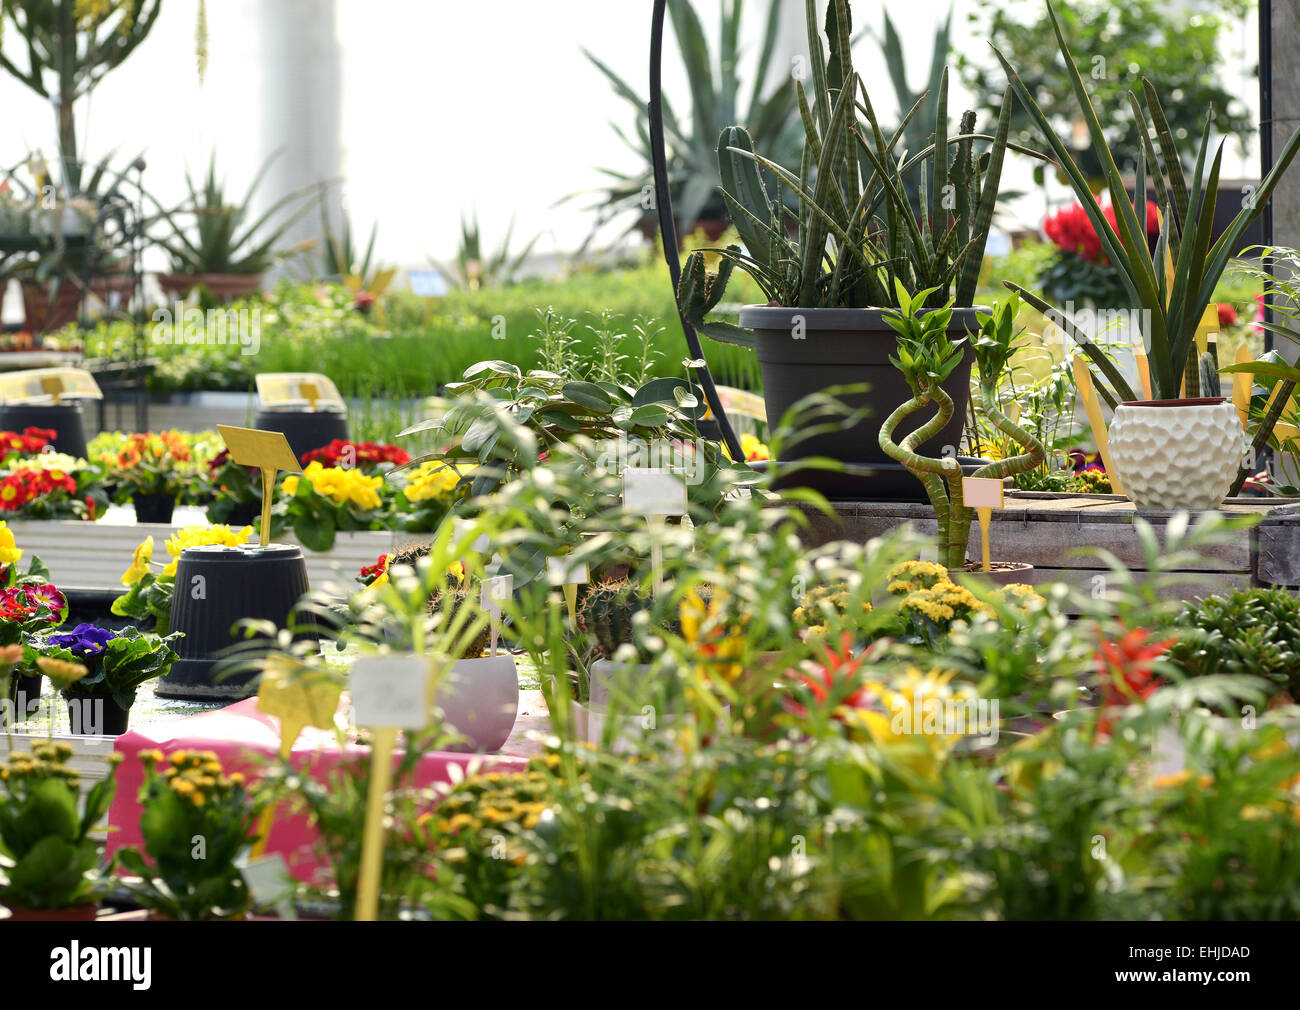 Various Healthy Blooming Flowering Plants on Pots Growing in a Nursery - Stock Image